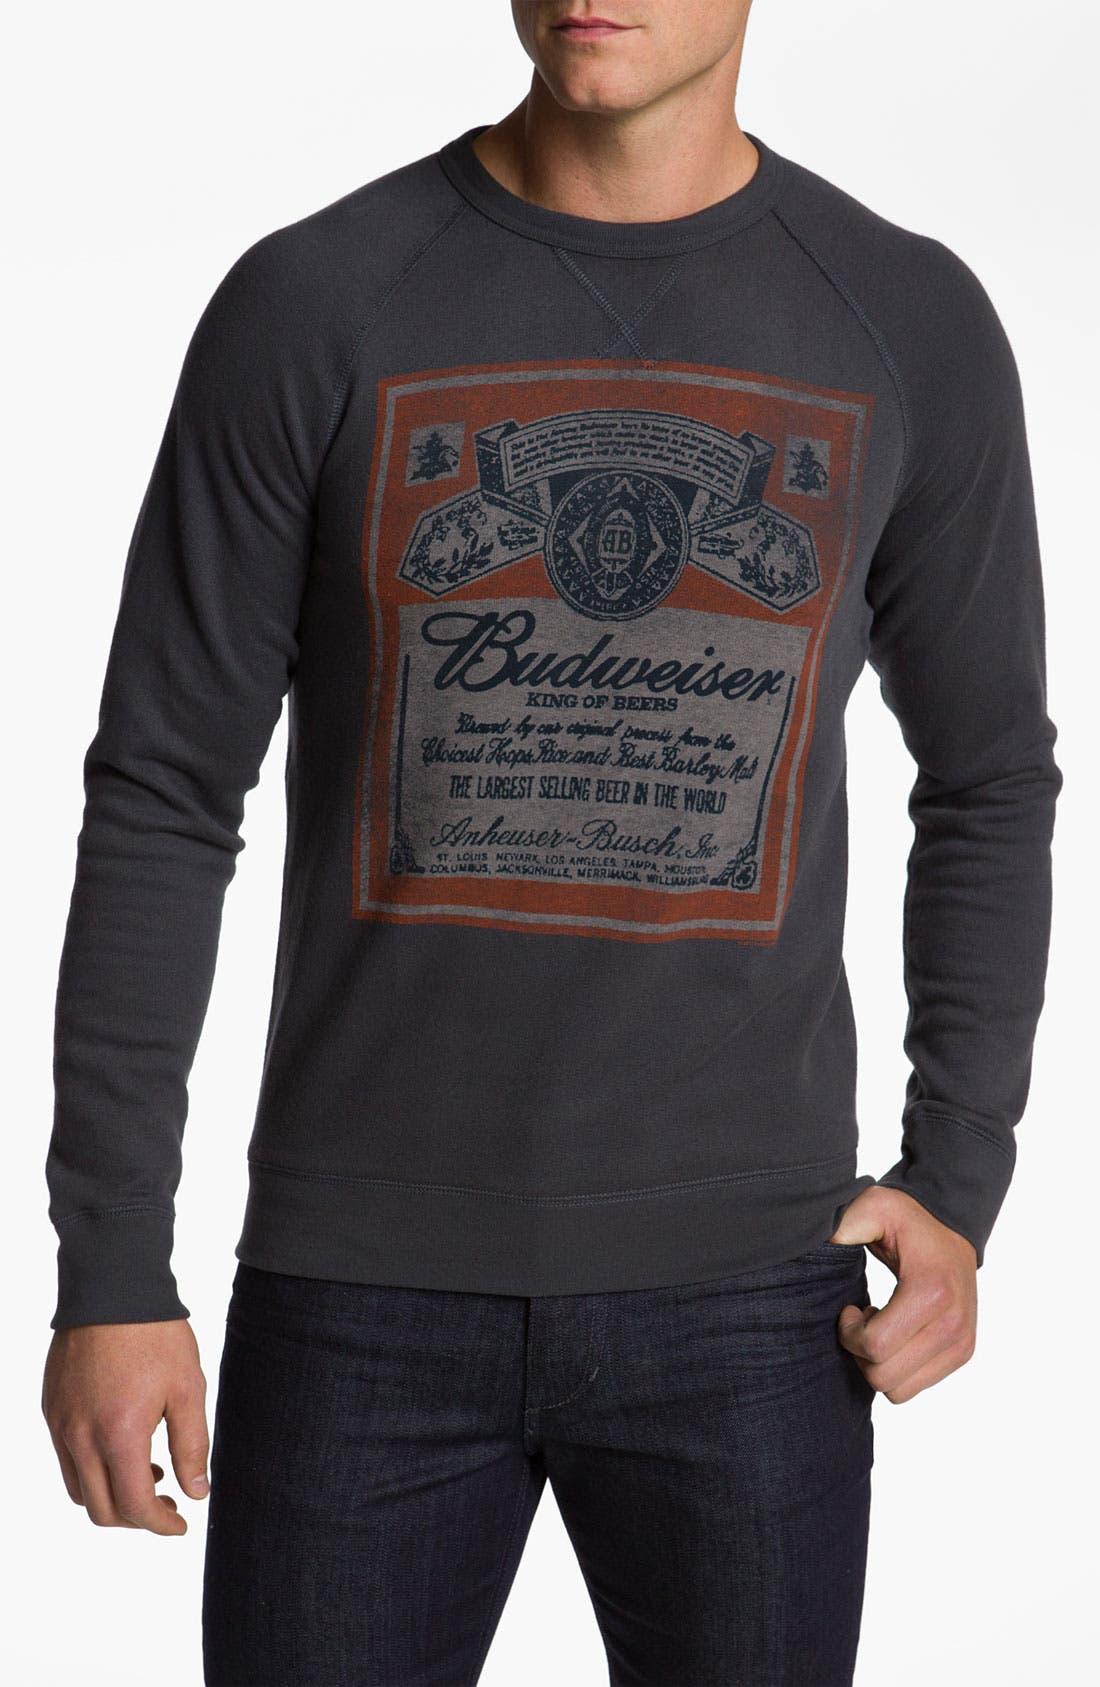 Alternate Image 1 Selected - Junk Food 'Budweiser' Crewneck Sweatshirt